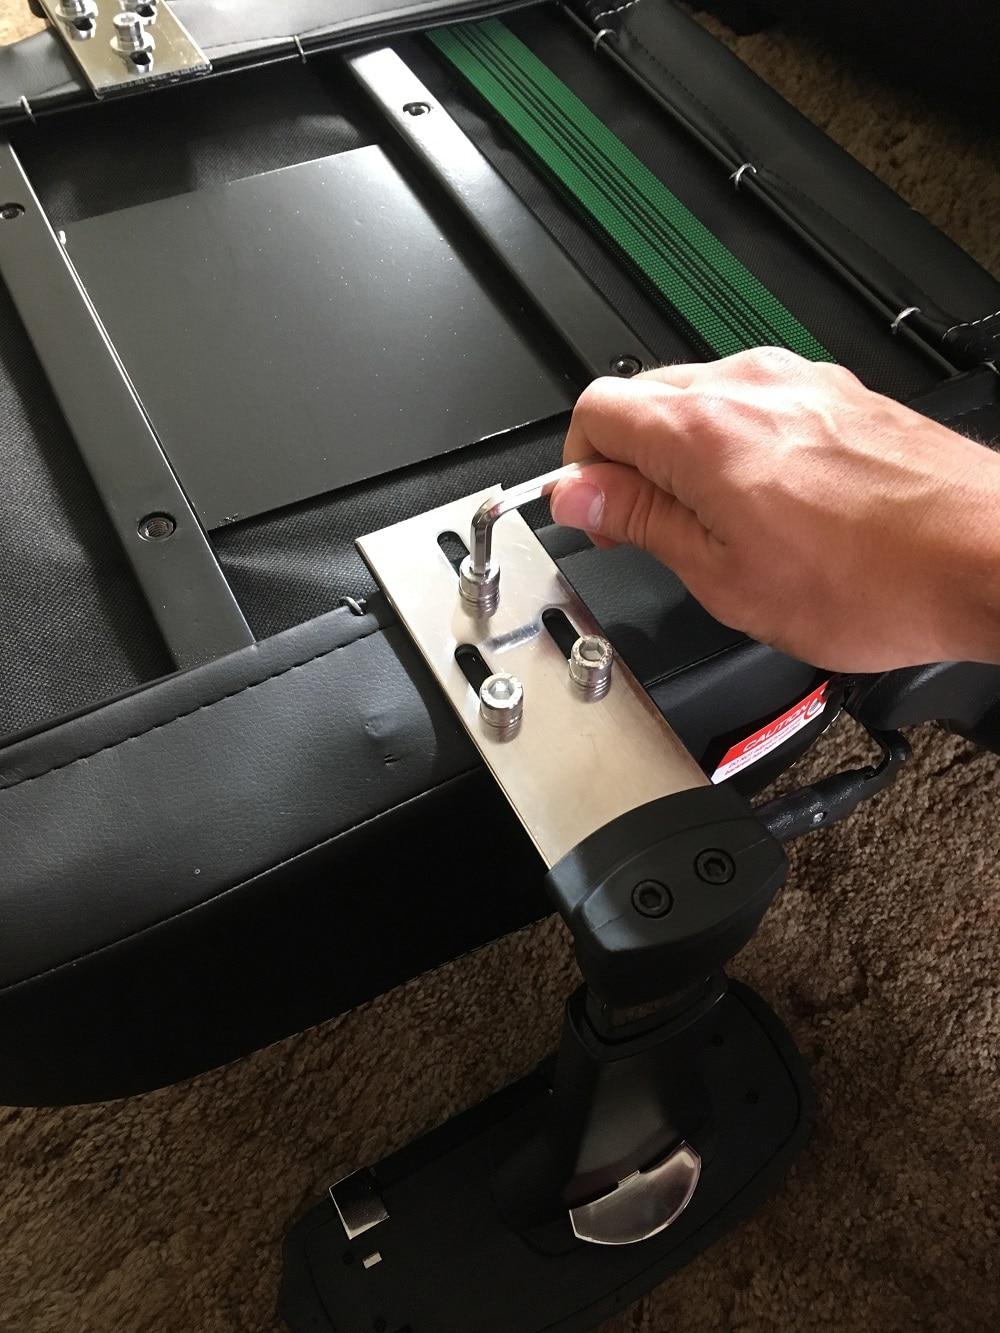 Maxonomic Ergoceptor Pro Gaming Chair Review 3